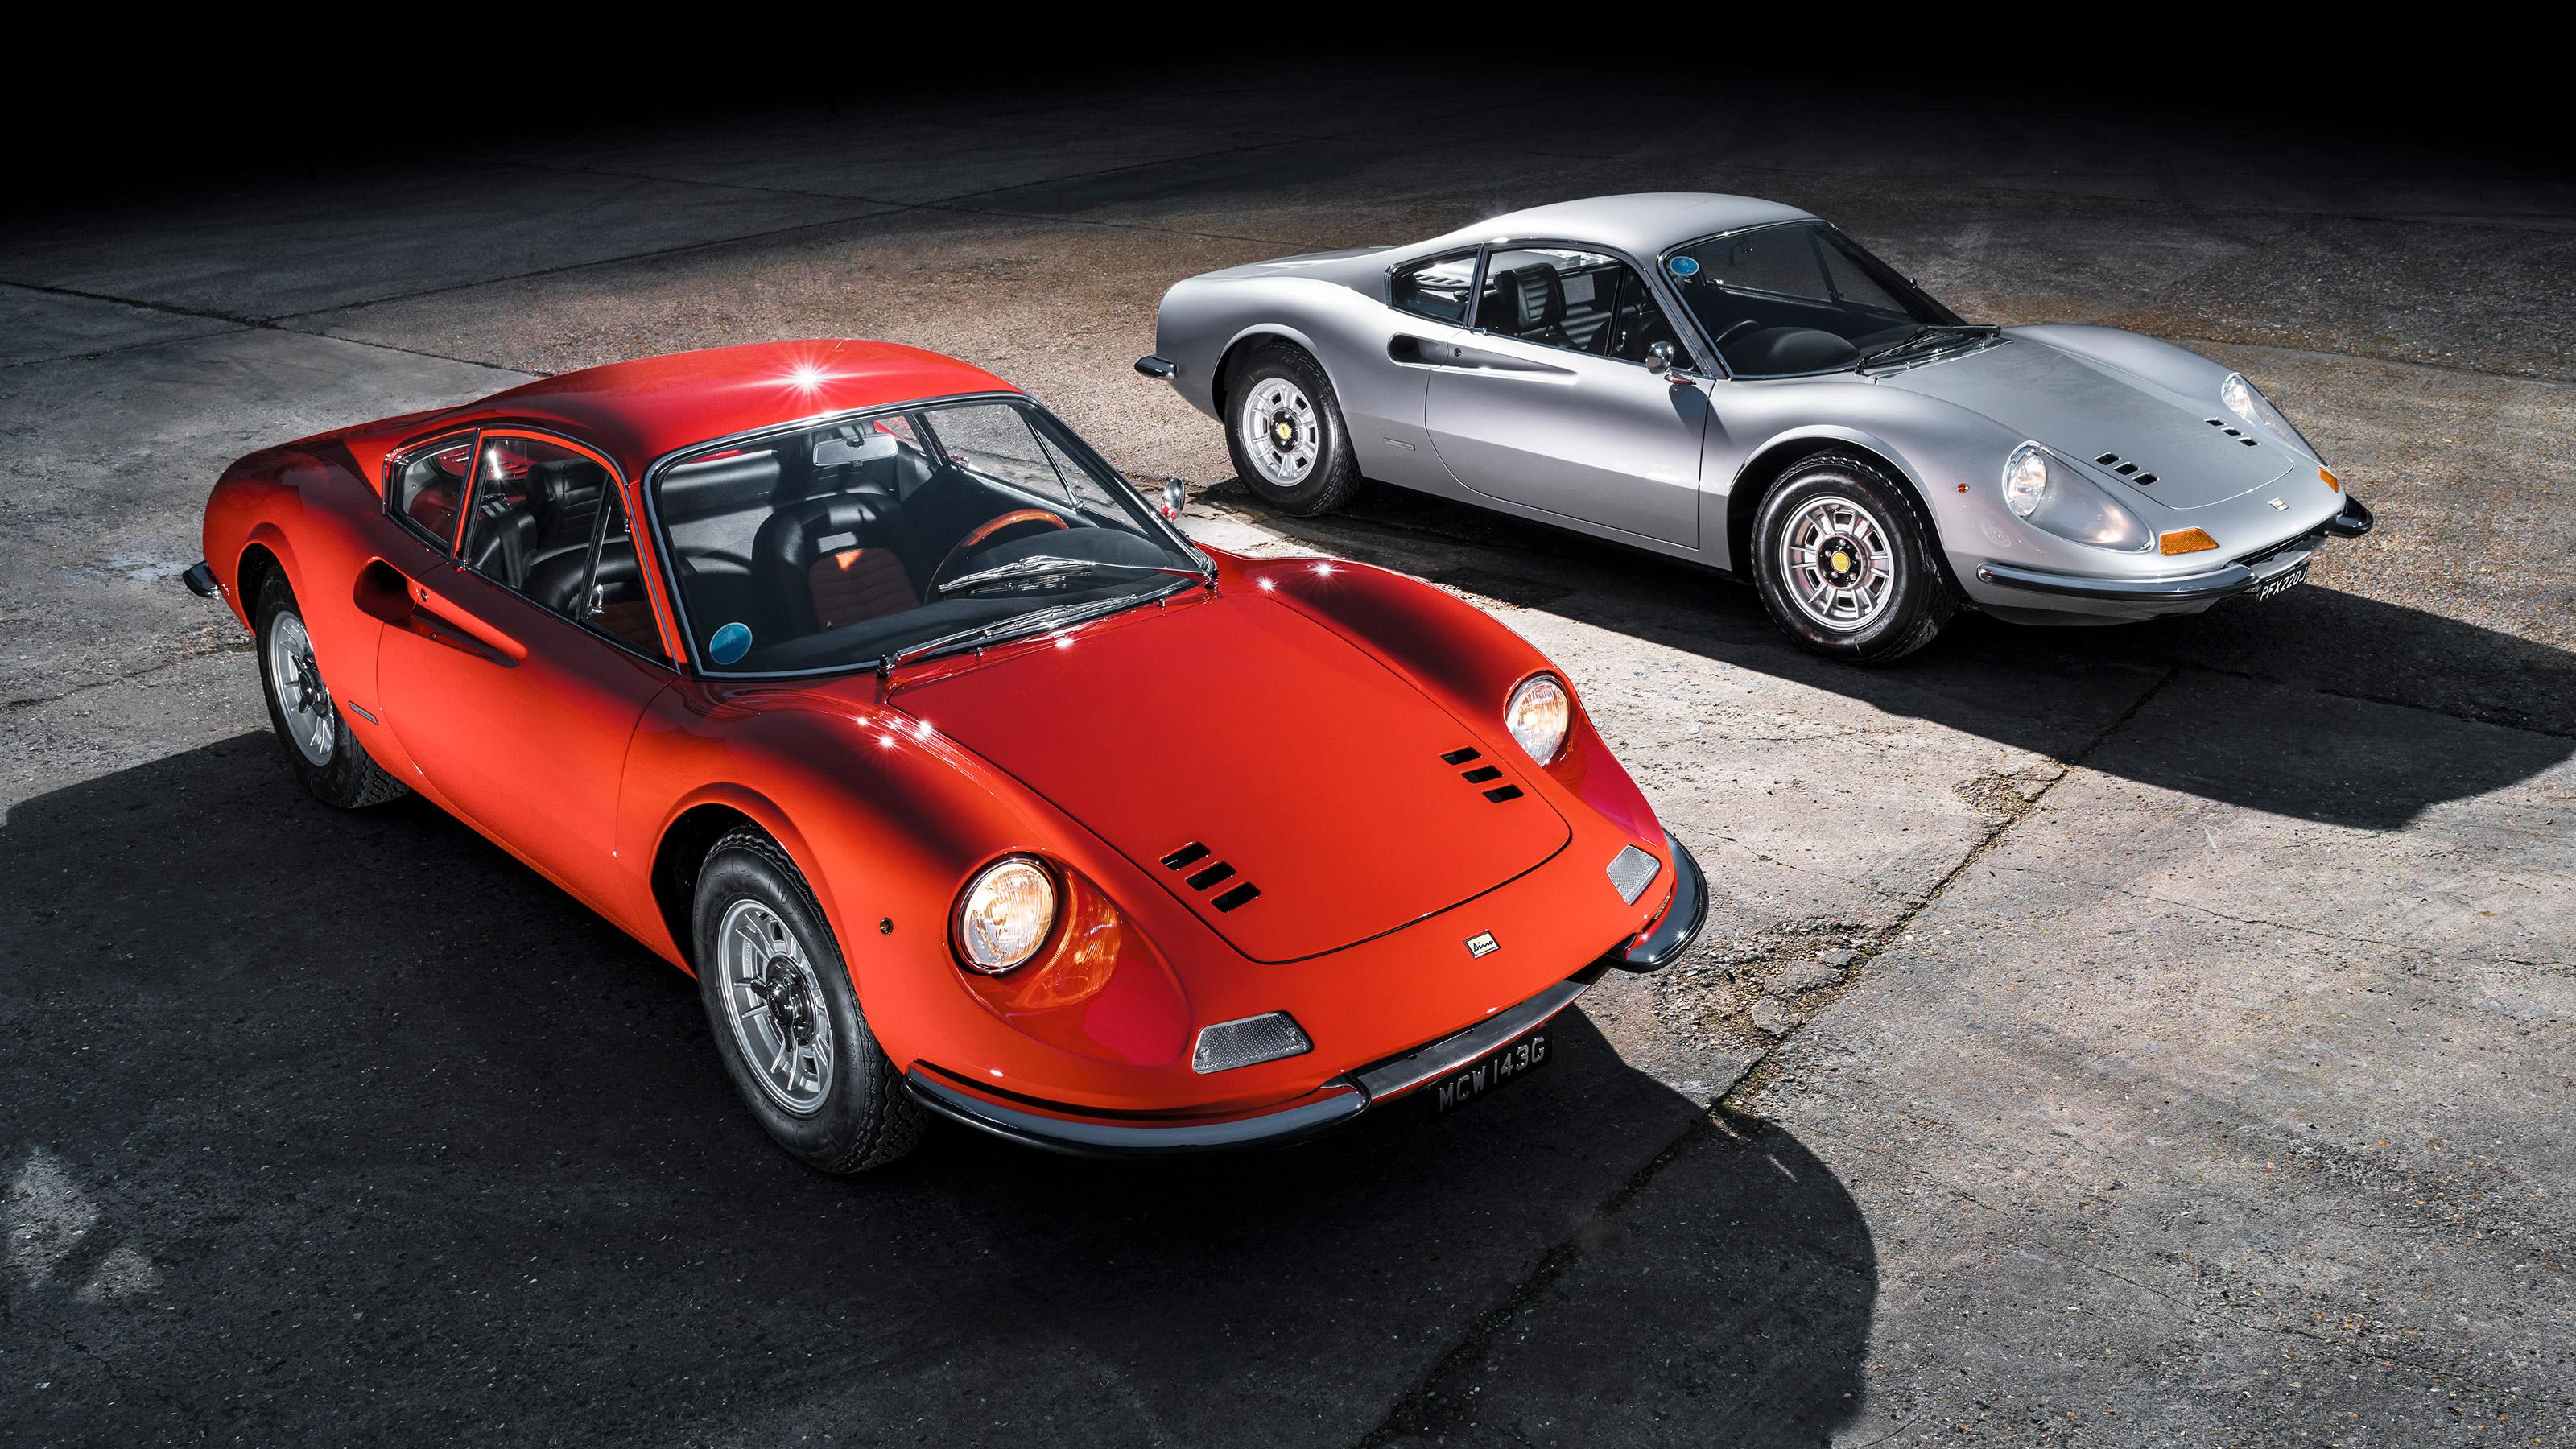 Ferrari Dinos Go Head To Head 246 Gt V 206 Gt Evo